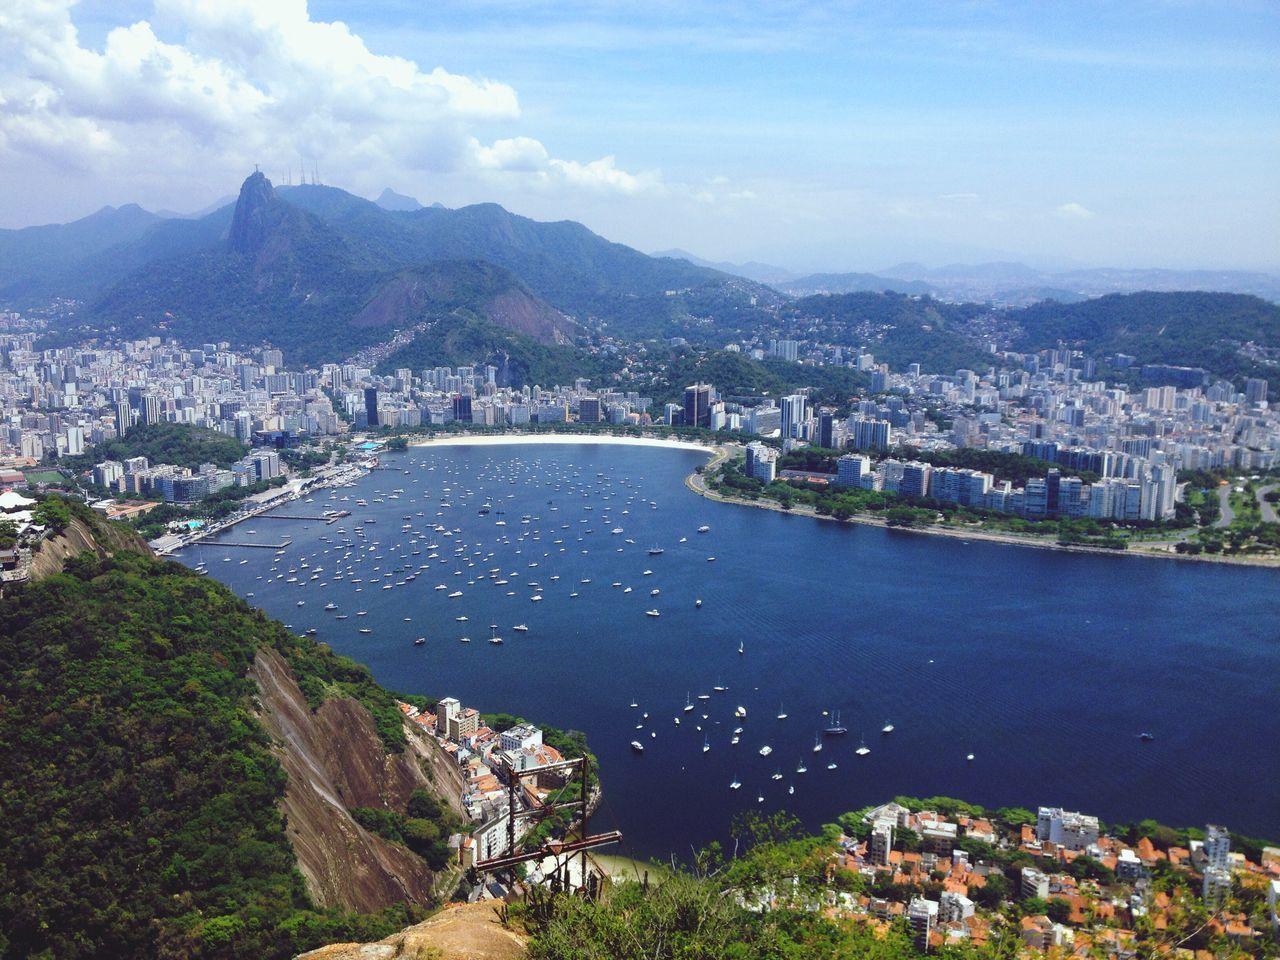 Colors And Patterns Rio De Janeiro Eagle Eye View Eyeem Market Welcome To My World Baía De Guanabara